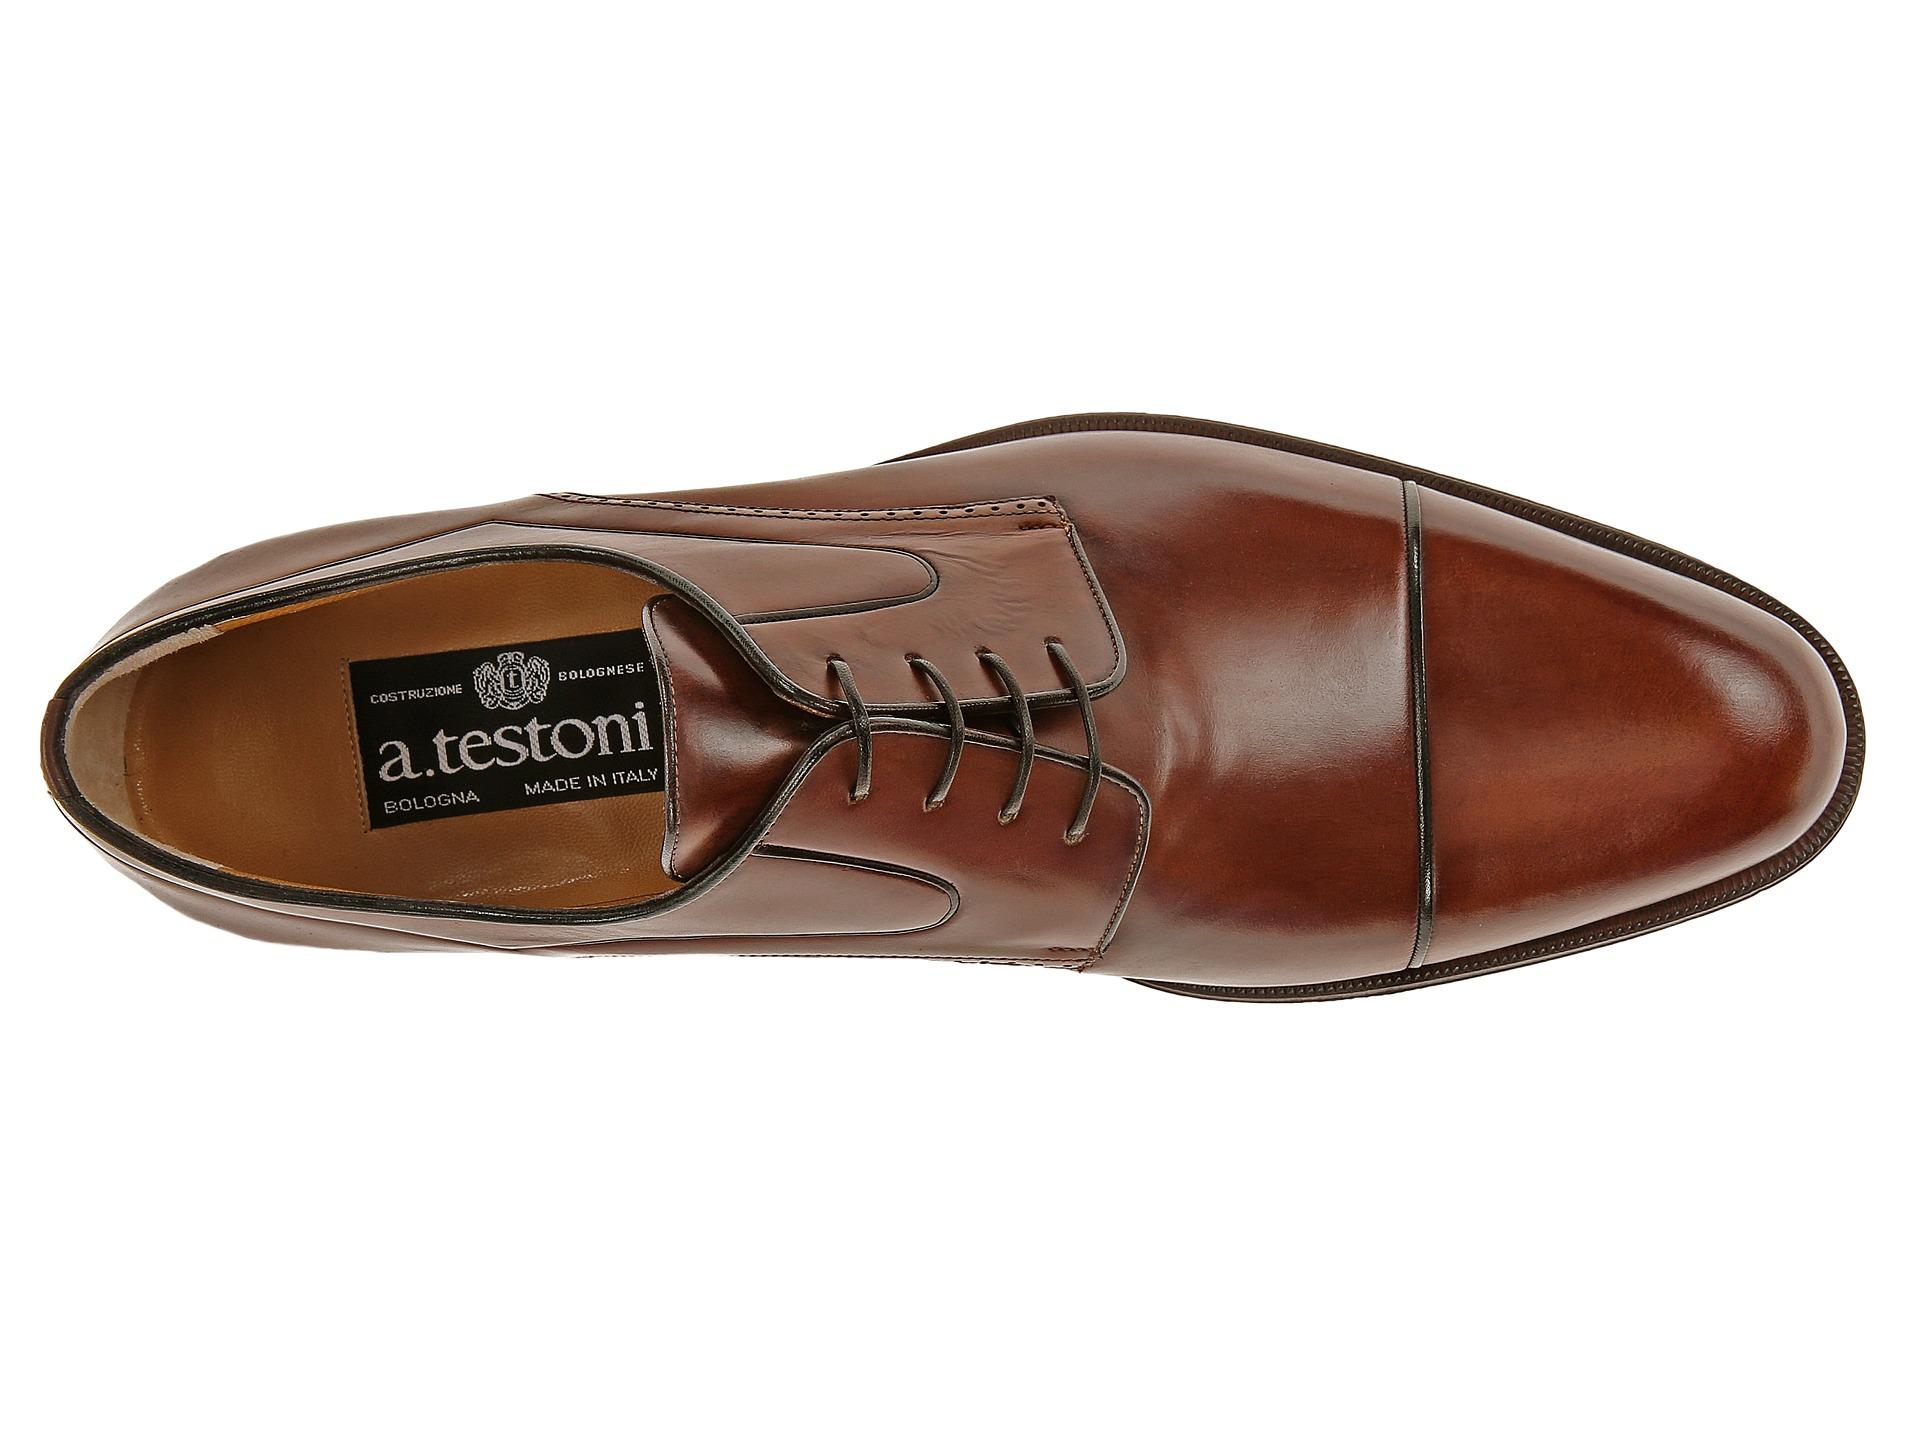 Testoni Black Label Shoes